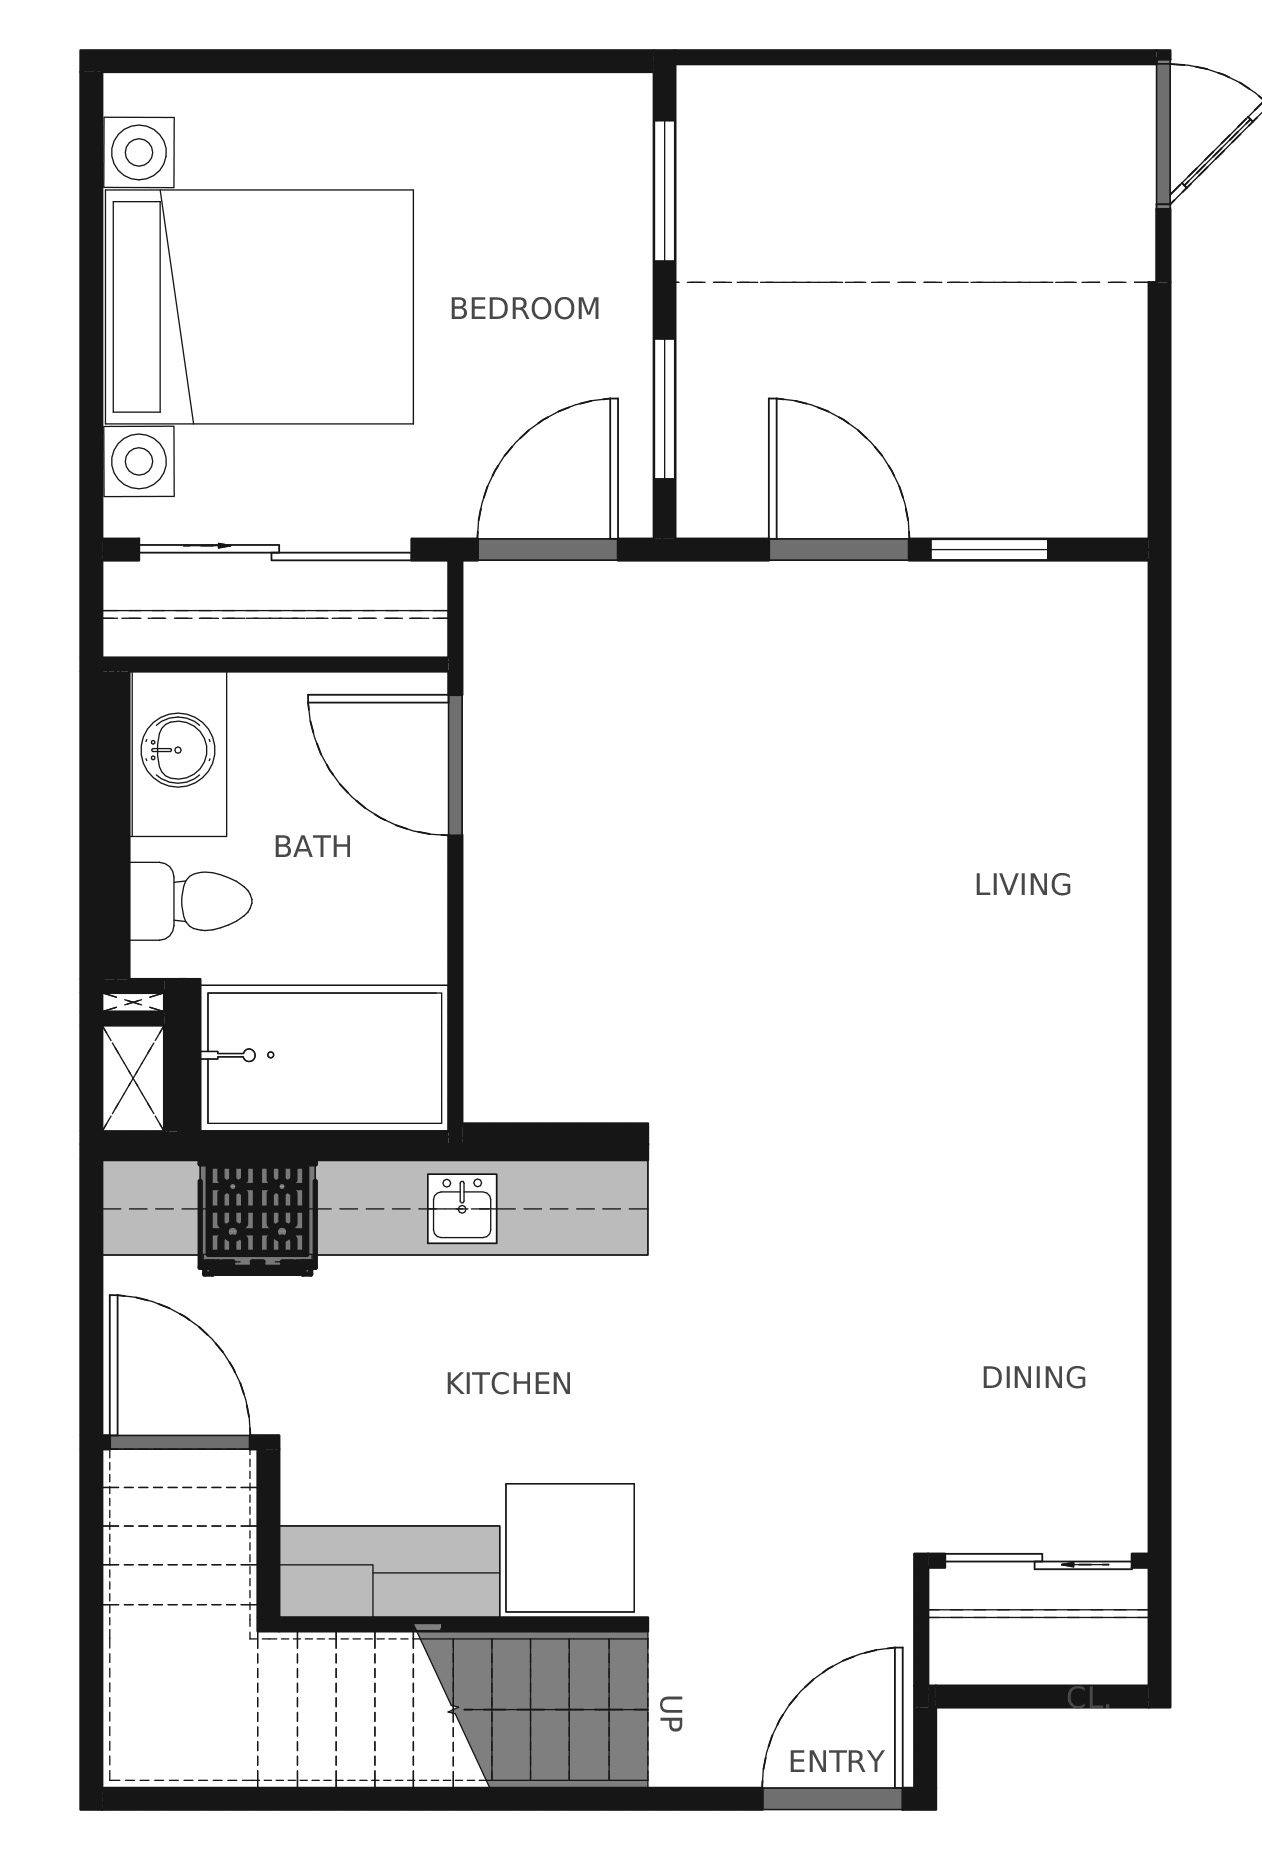 Plan C4 First Floor - 1,366 sq. ft.